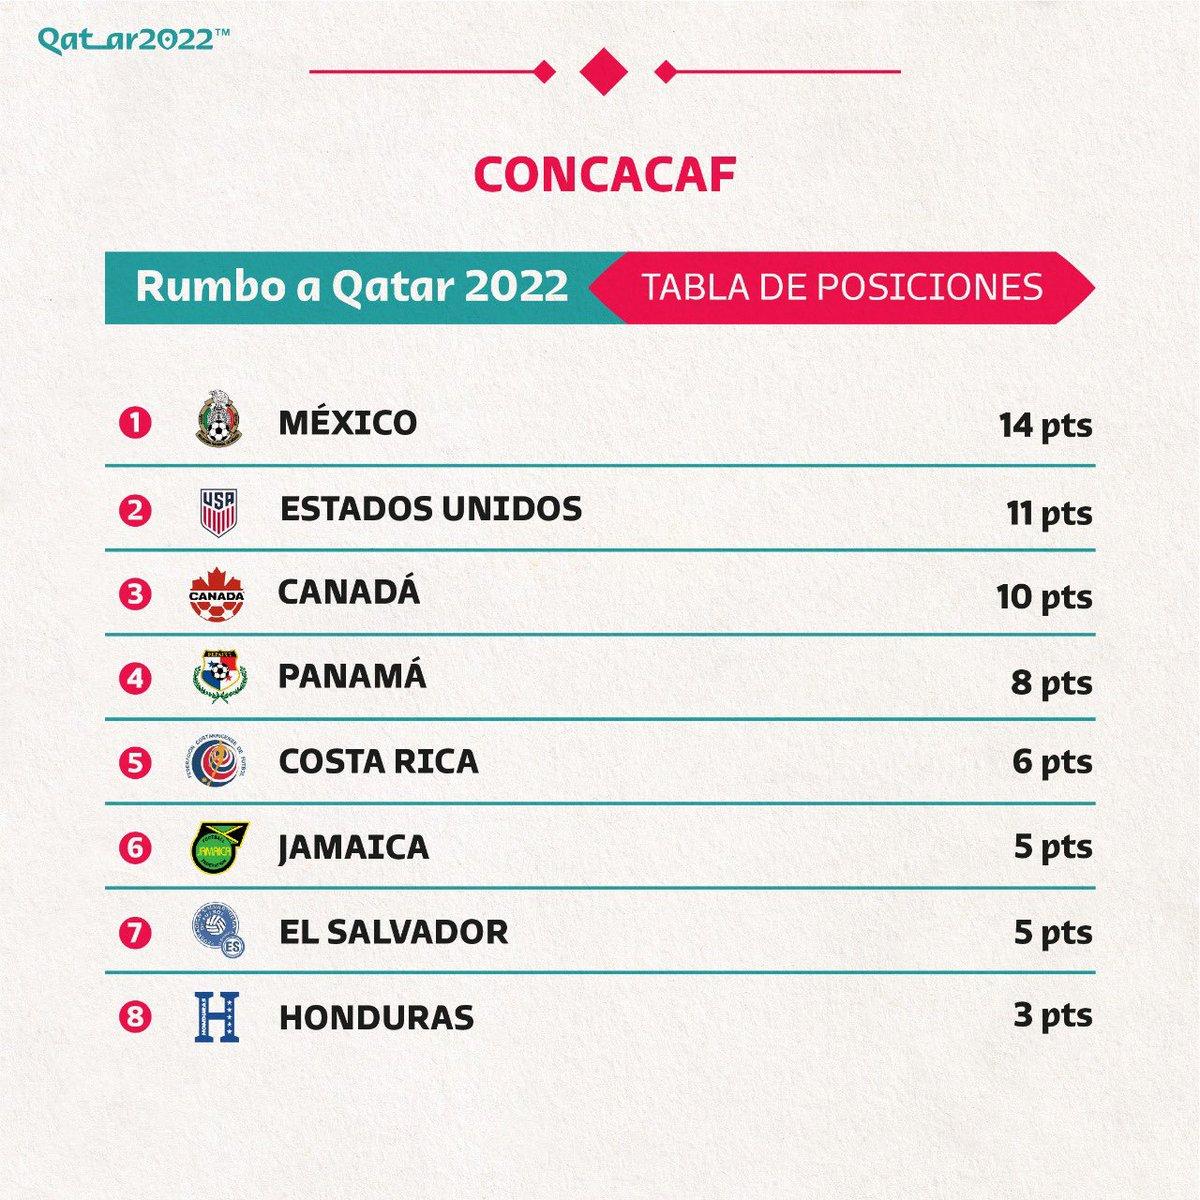 @roadto2022es's photo on CONCACAF